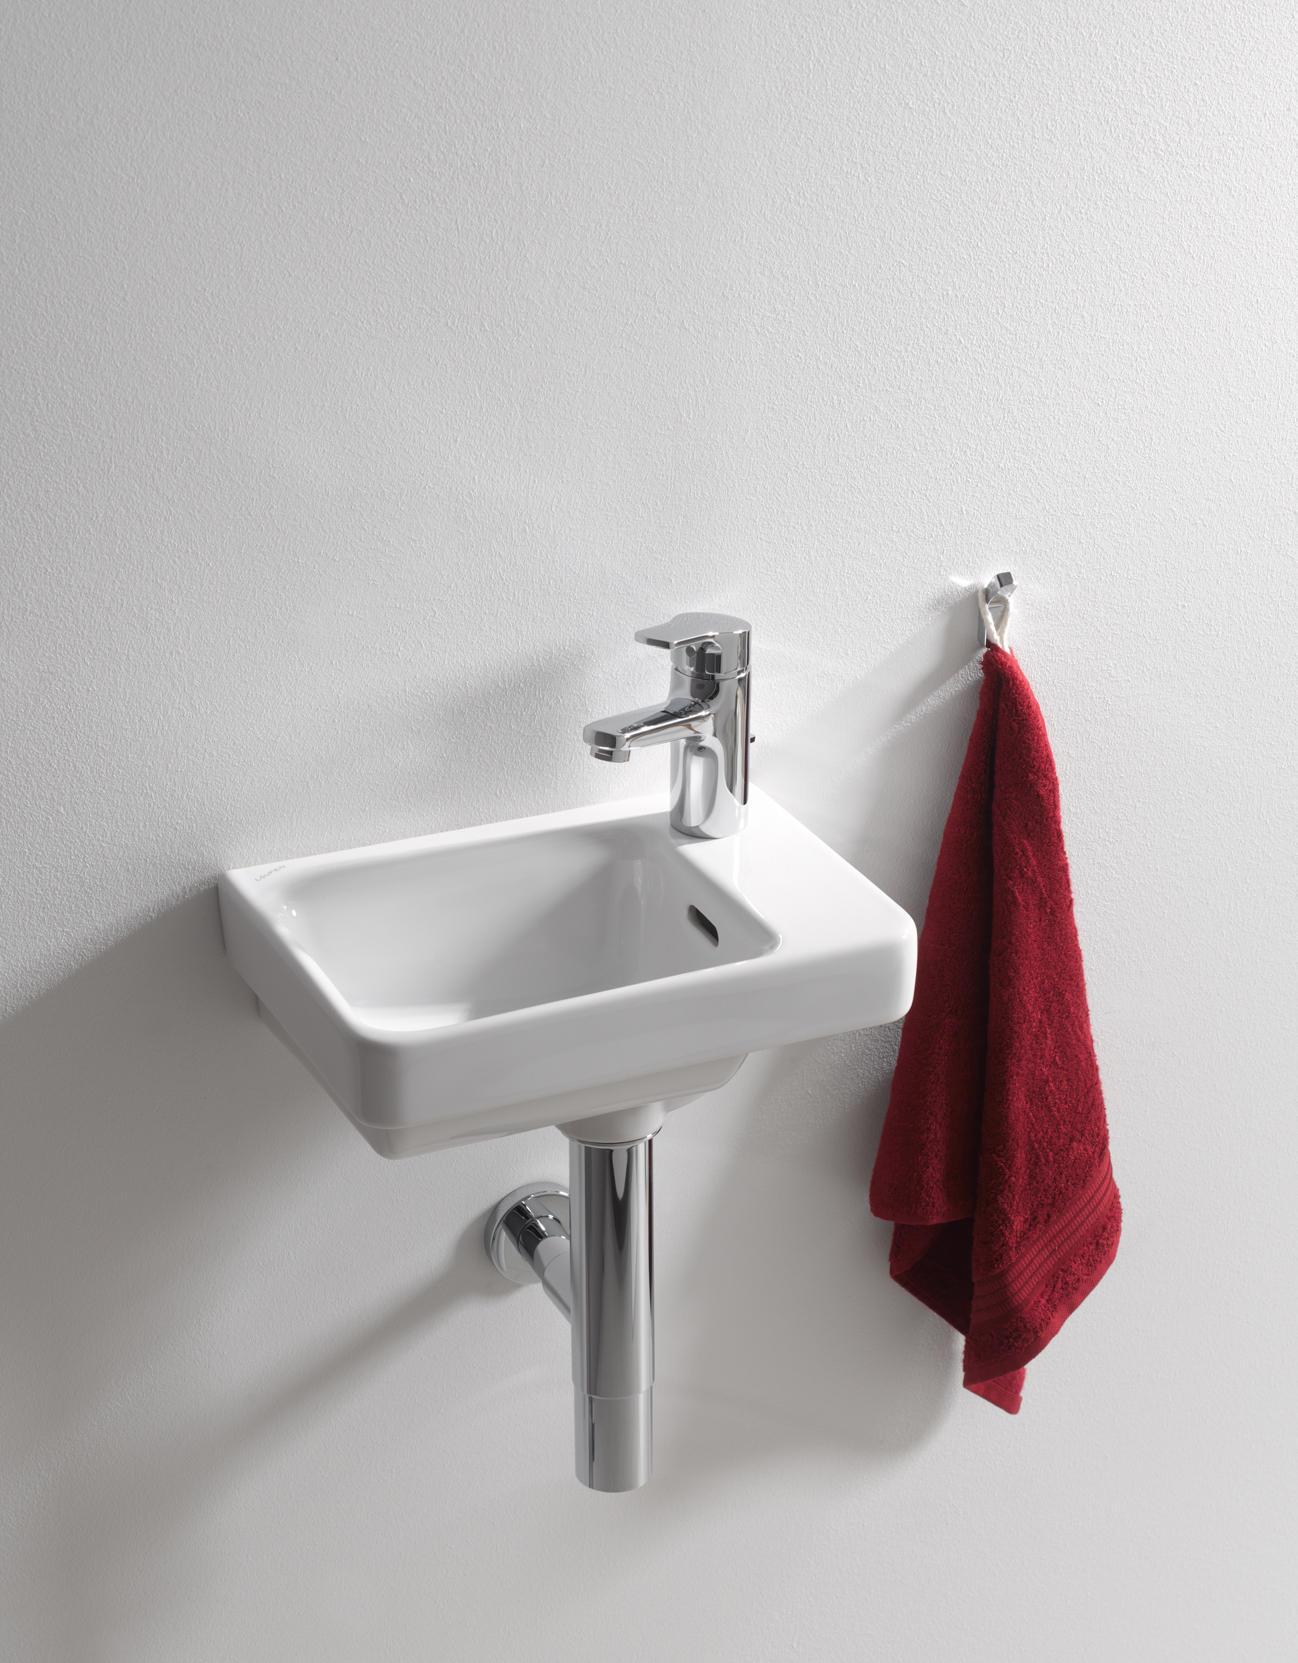 laufen pro s small washbasin asymmetric wash basins from laufen architonic. Black Bedroom Furniture Sets. Home Design Ideas